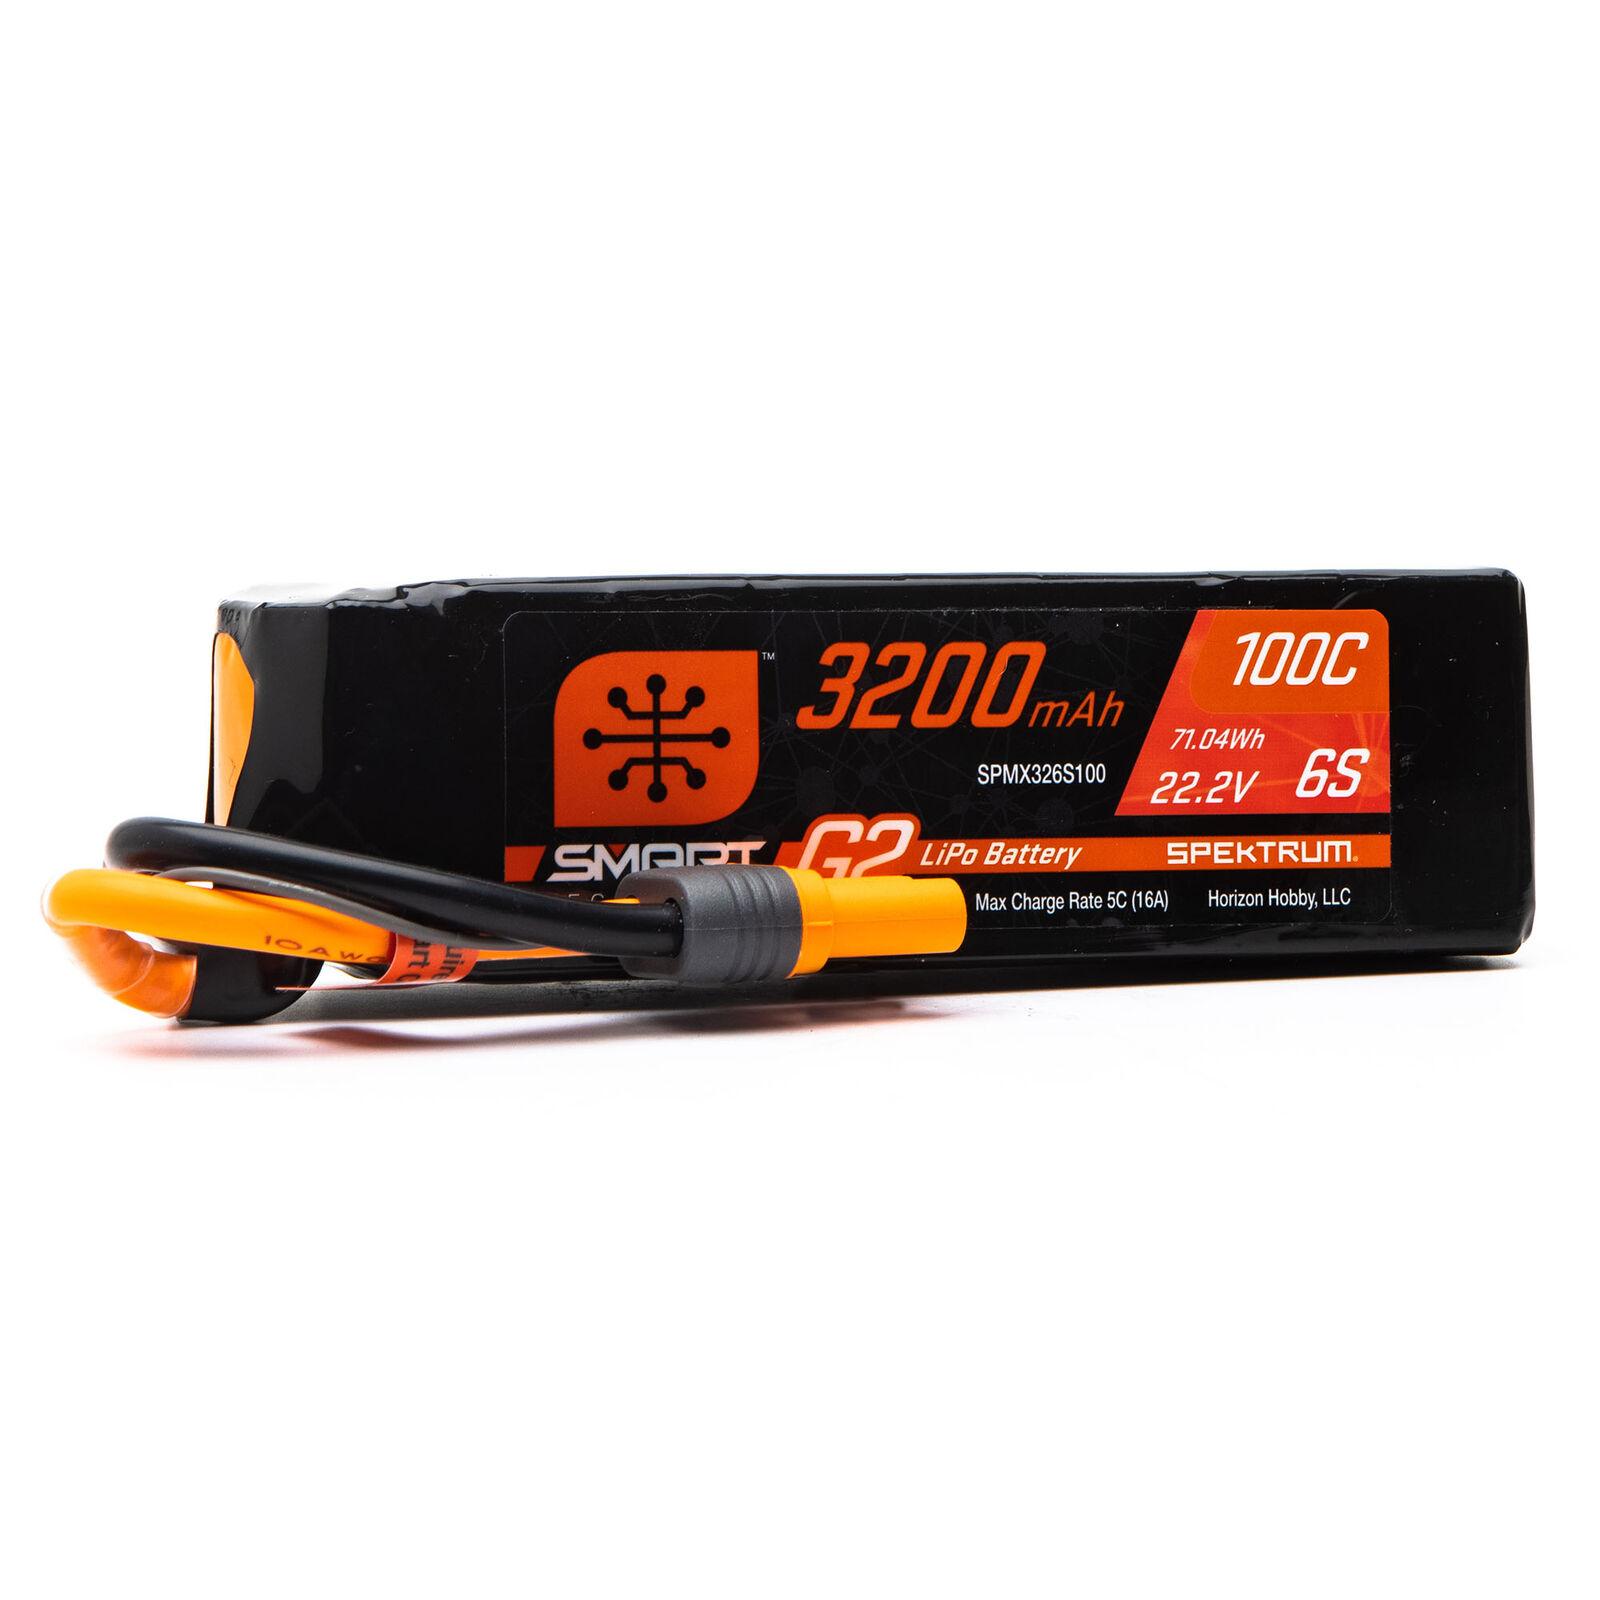 22.2V 3200mAh 6S 100C Smart G2 LiPo Battery: IC5